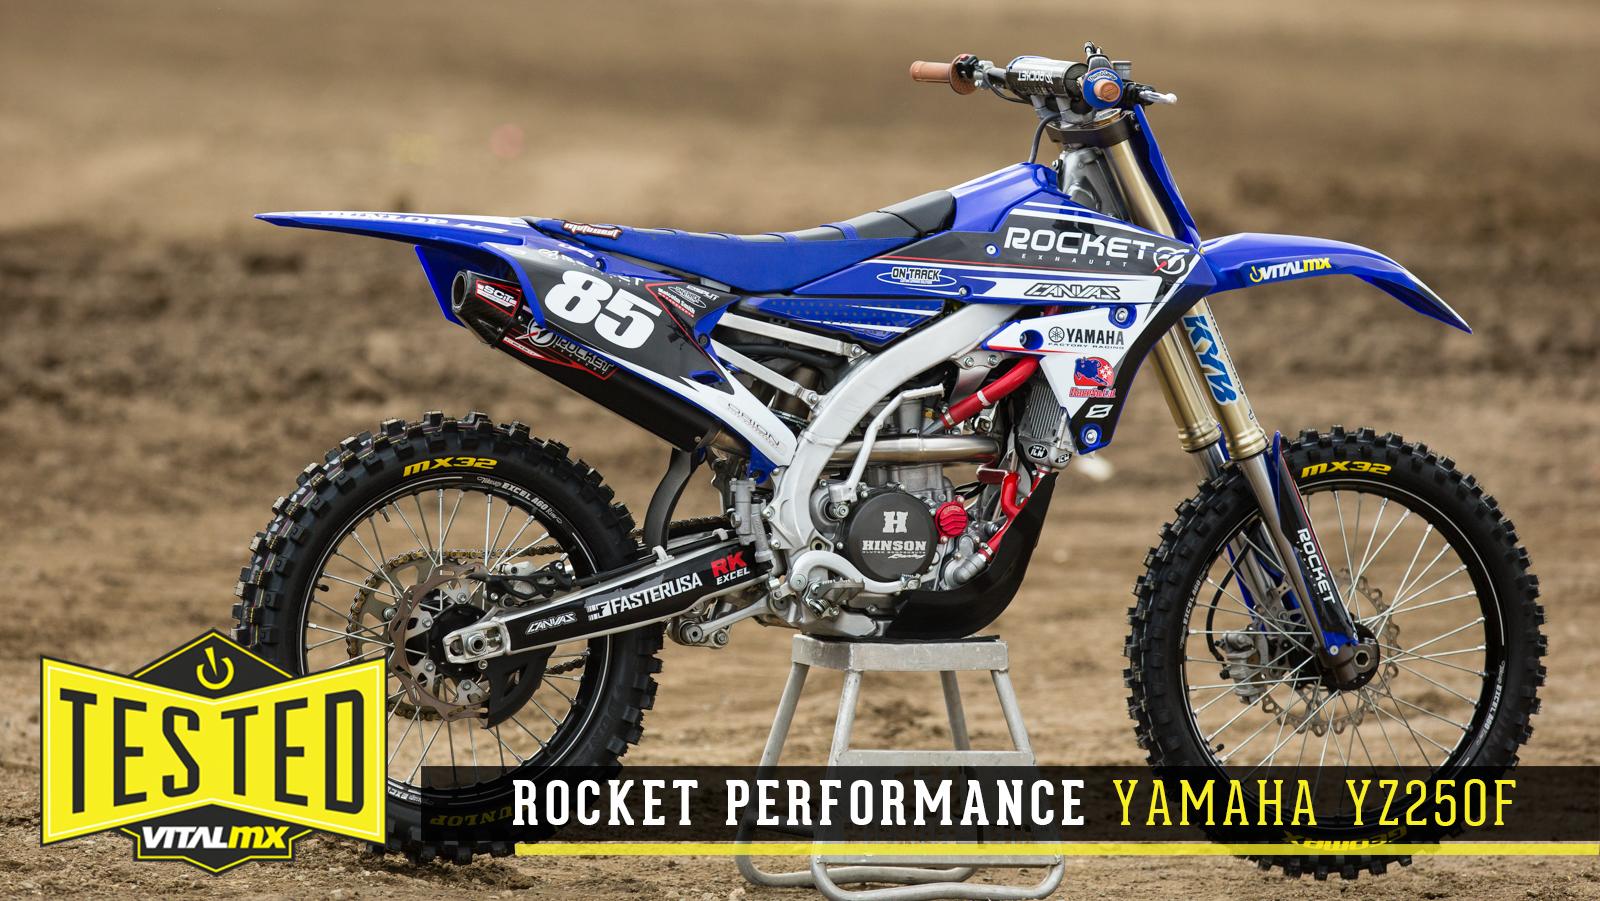 Tested rocket performance yamaha yz250f motocross for Yamaha yzf 250f